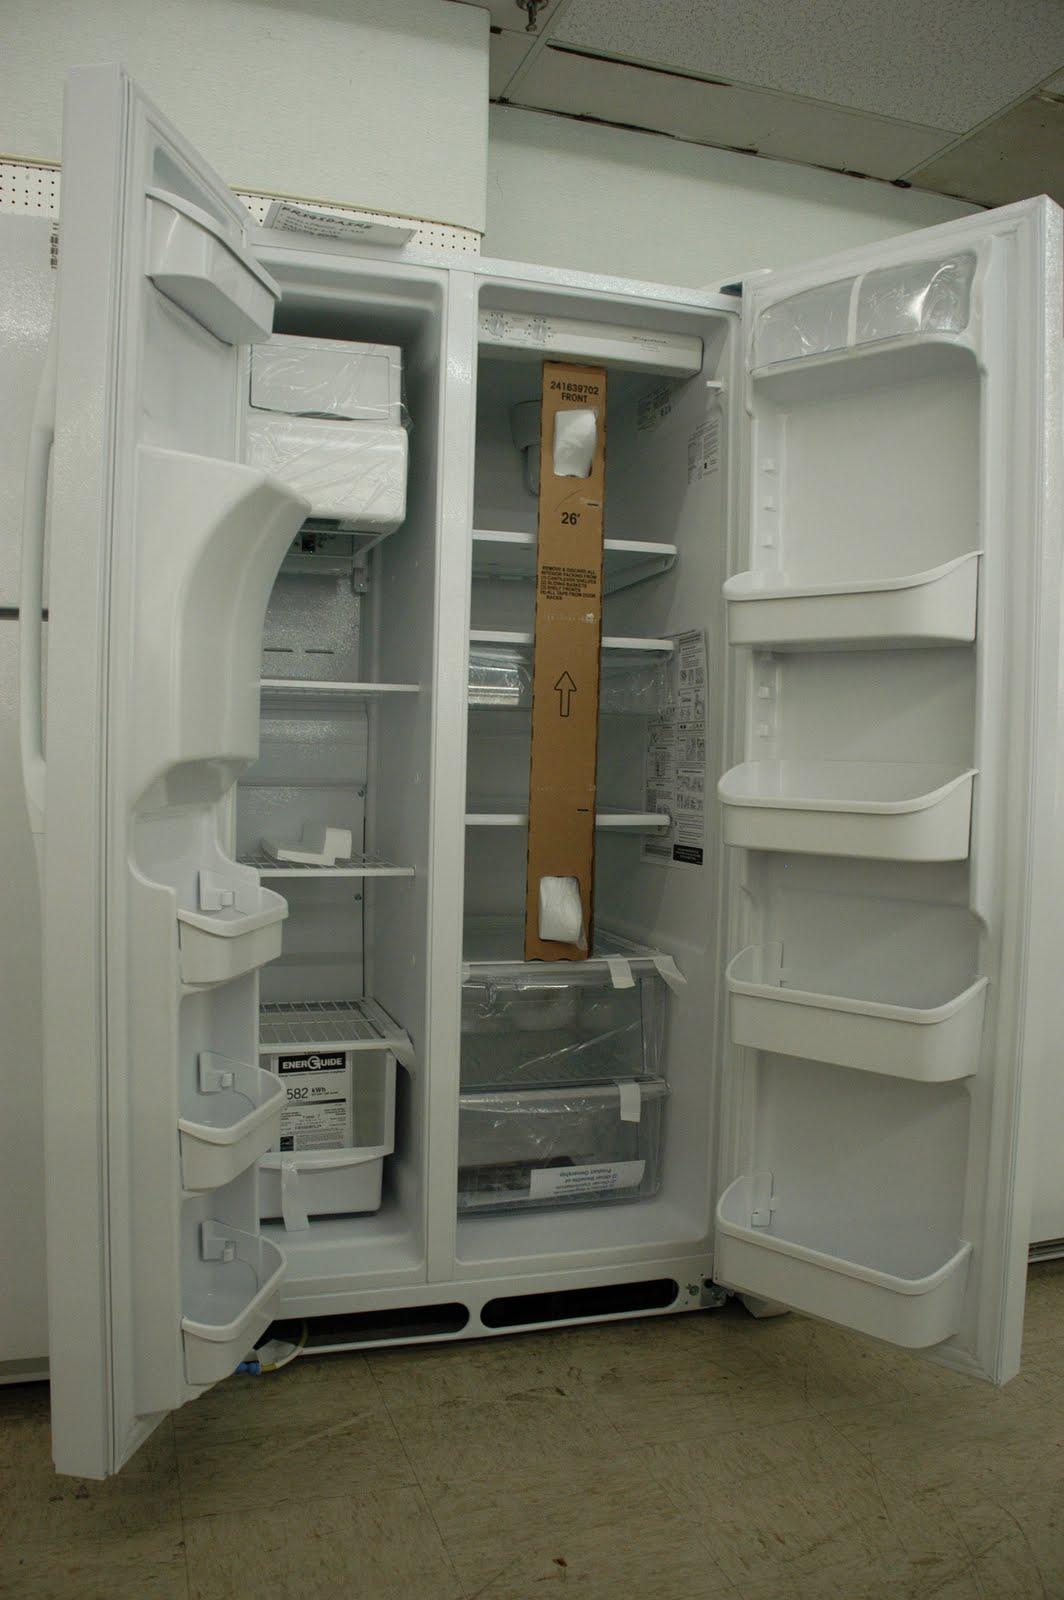 Appliance Direct Video Blog: 200911 on whirlpool refrigerator shelf, kenmore refrigerator shelf, frigidaire refrigerator shelf, samsung refrigerator shelf, amana refrigerator shelf,